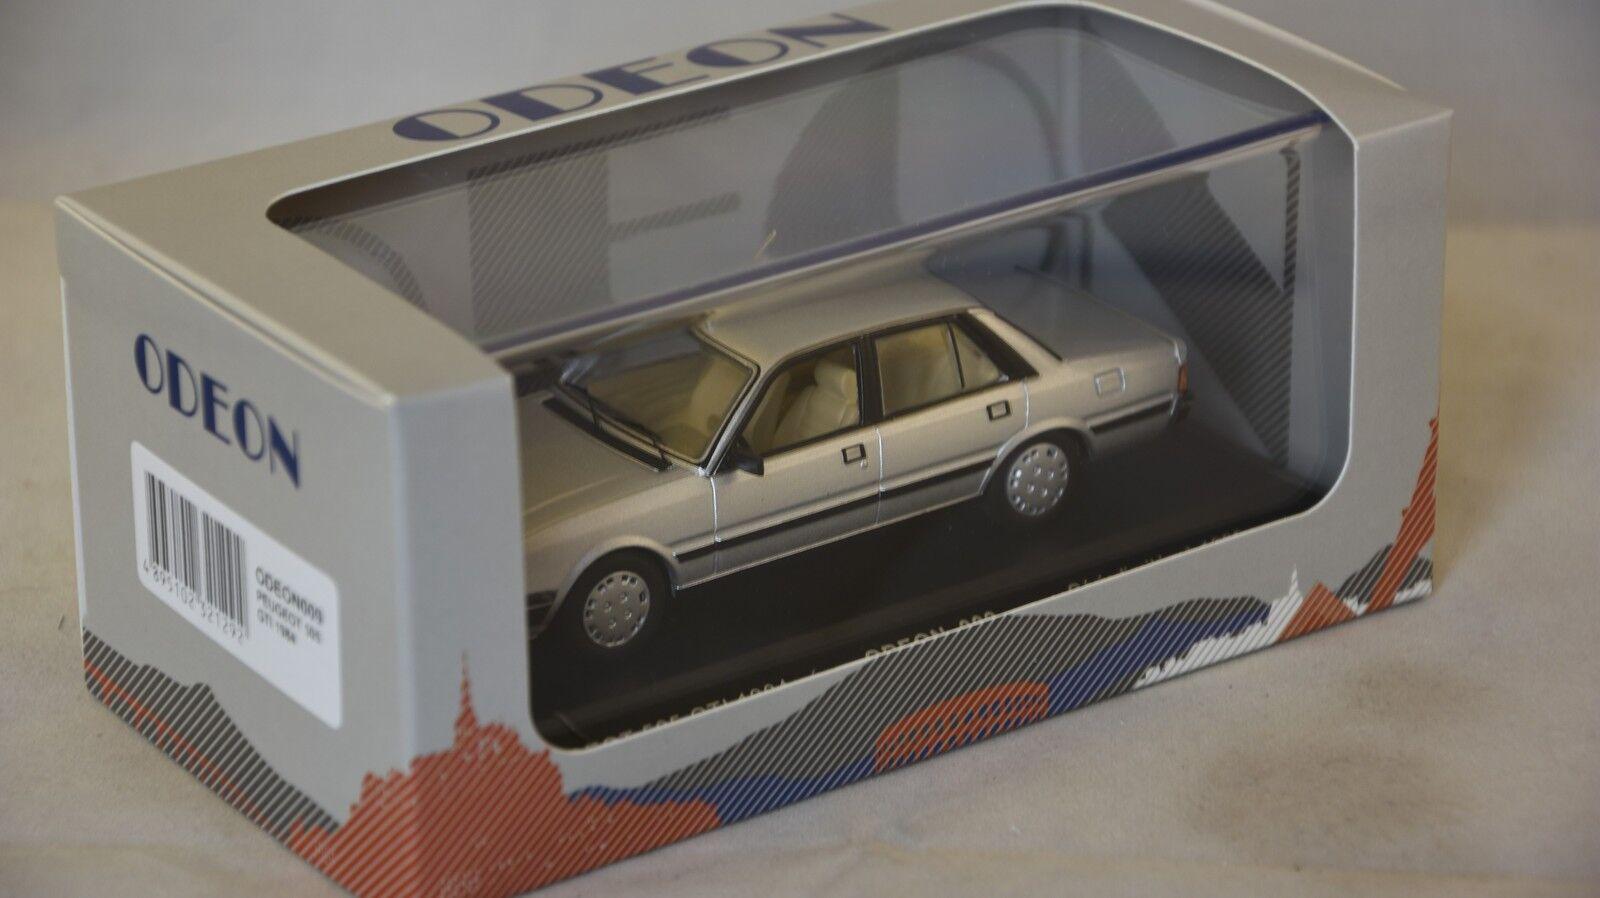 ODEON 009  - Peugeot 505 GTI 1984 Argent 1 43